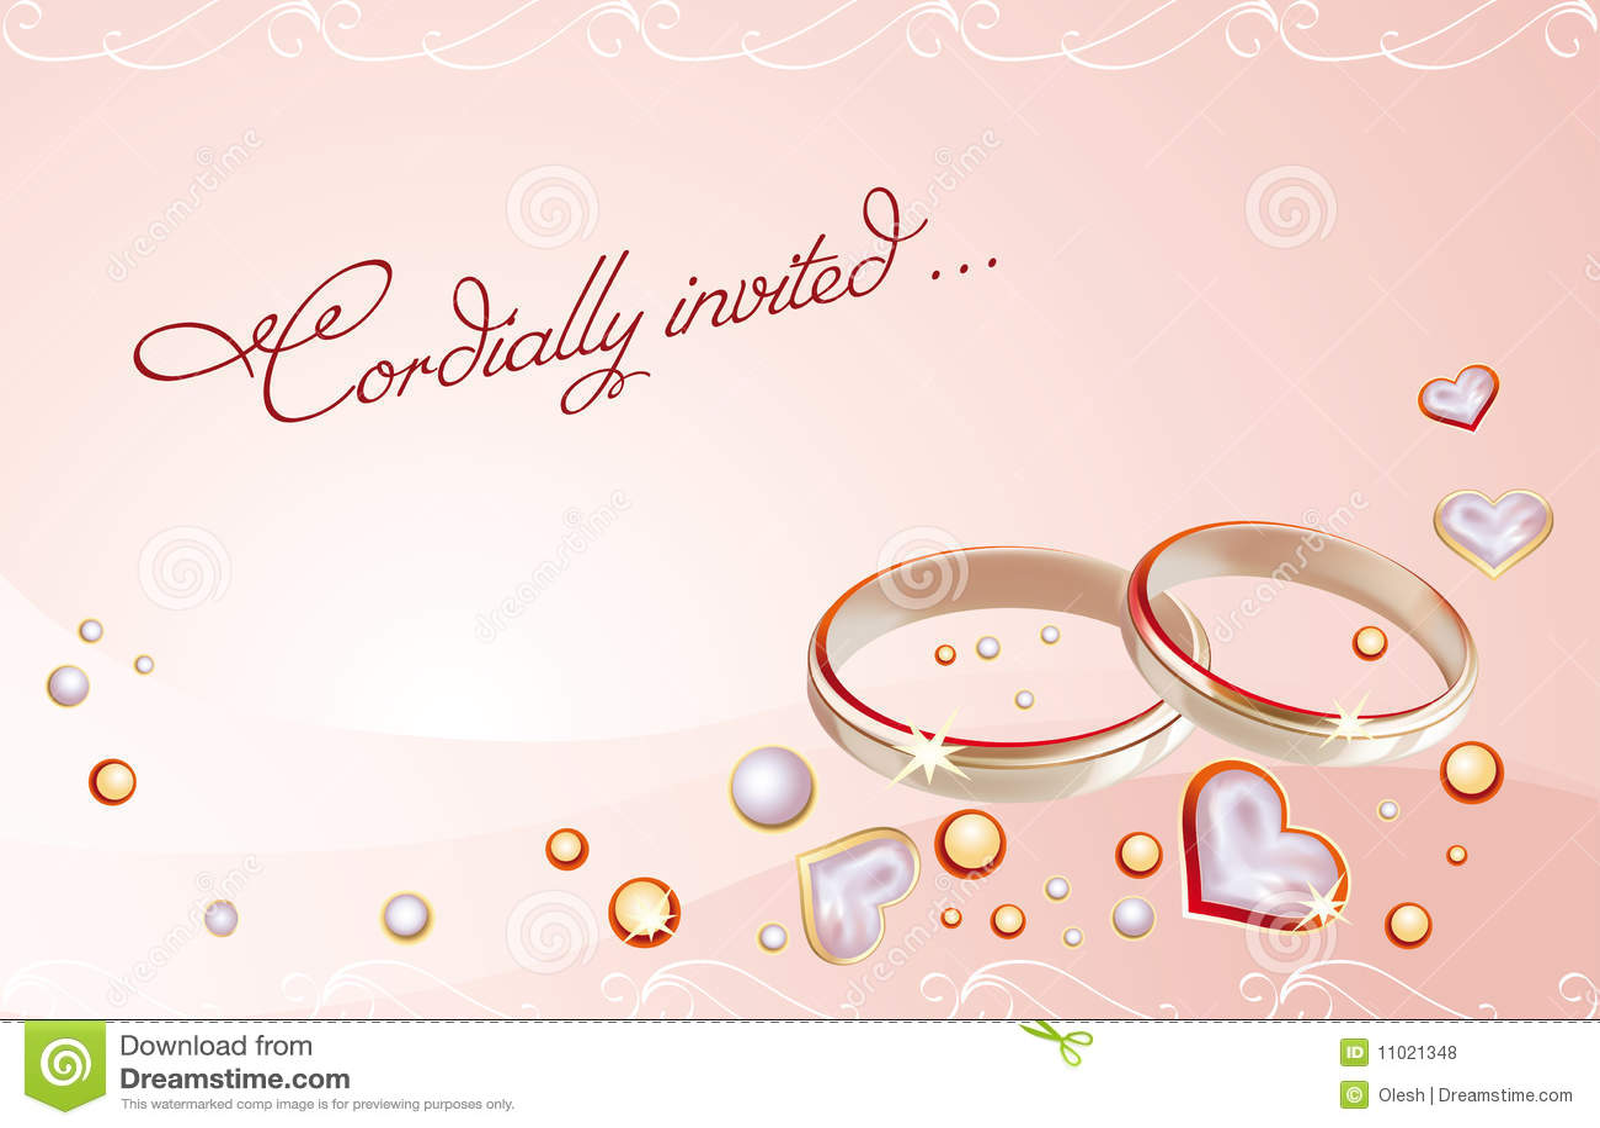 Blank Wedding Invitation with luxury invitation template